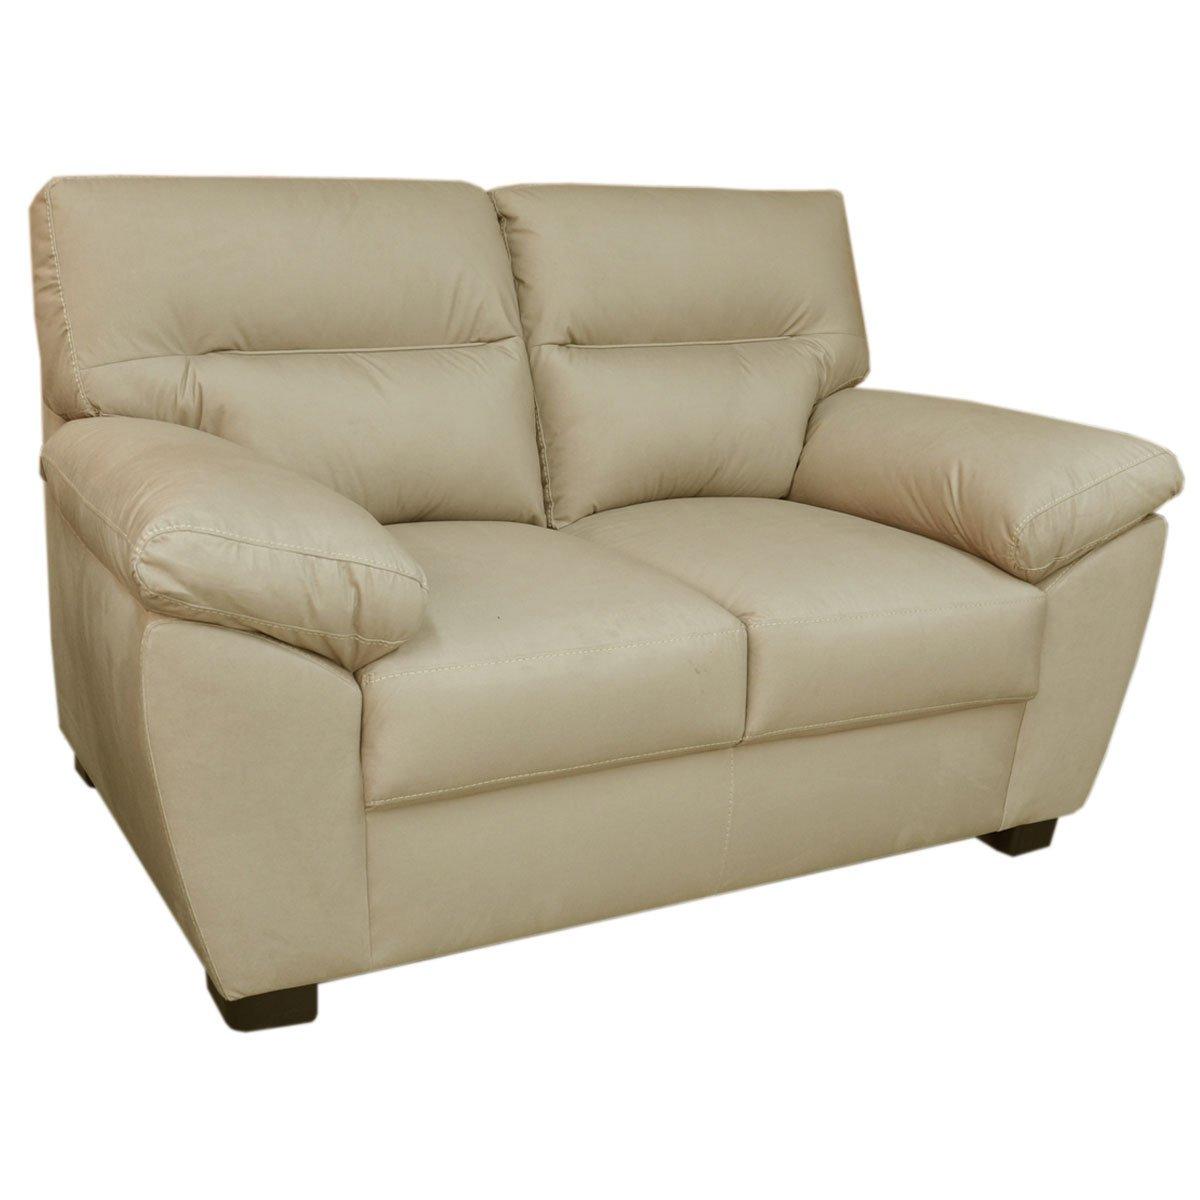 Love Seat Bartra Tapiz Tela Beige Muebles Liz Sears Com Mx Me  # Muebles Liz Sears